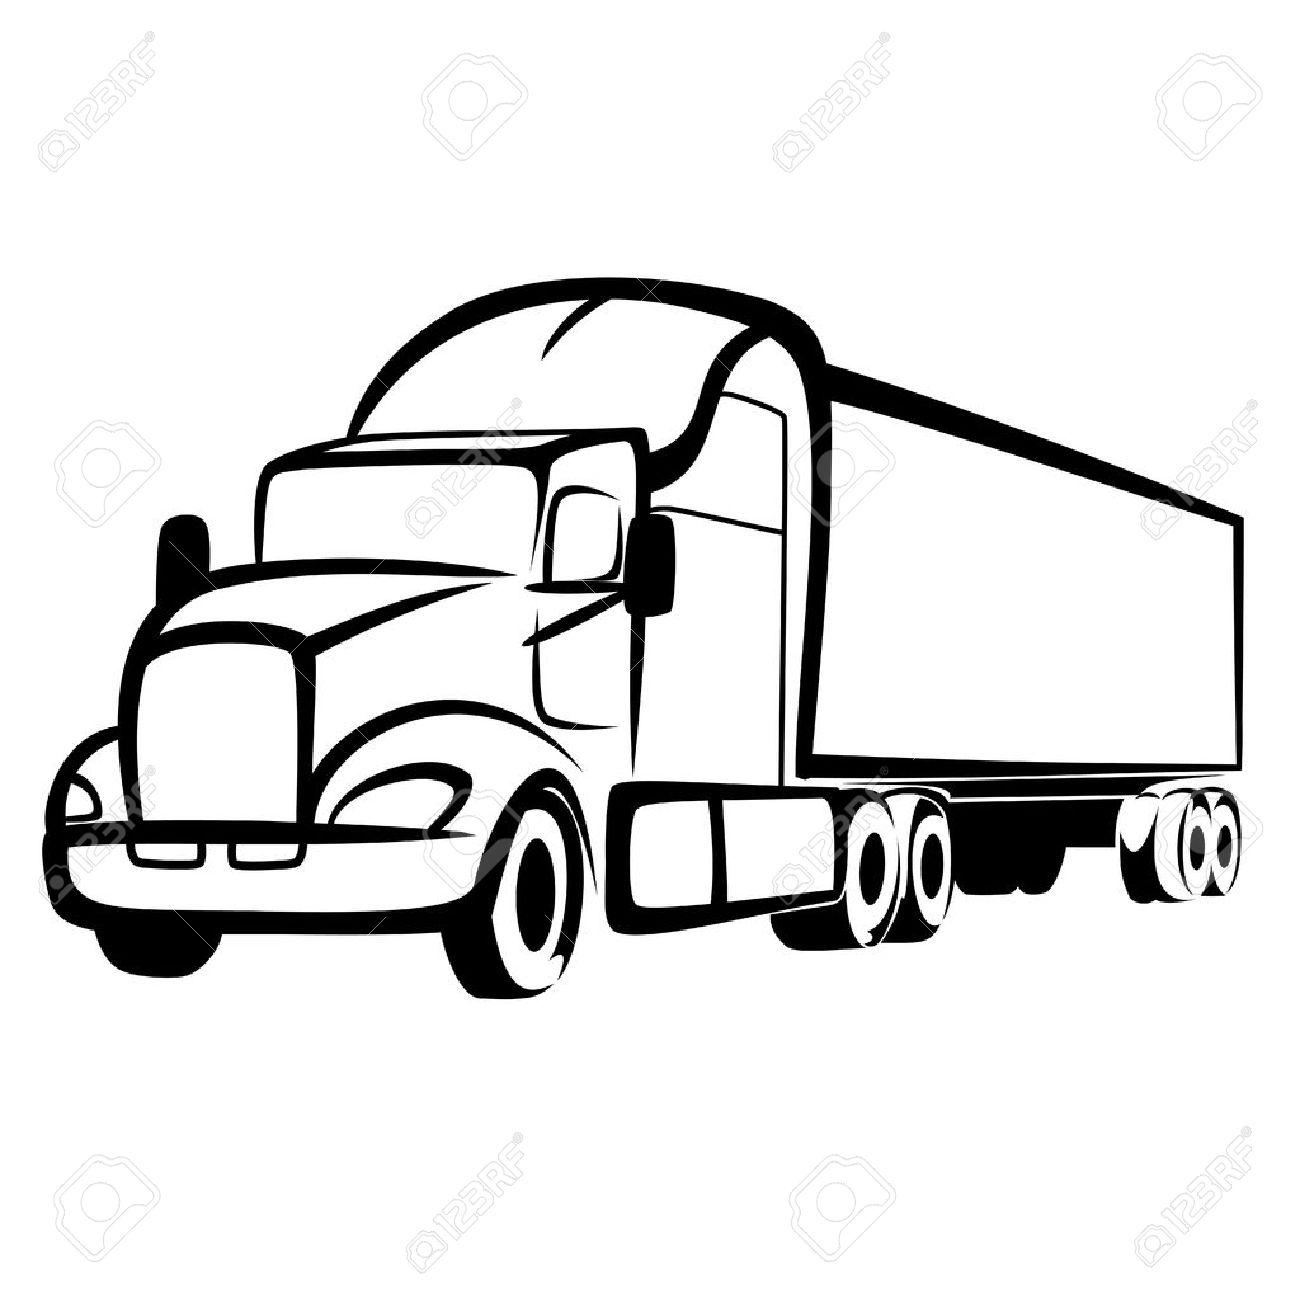 Semi Truck Clipart Black And White.